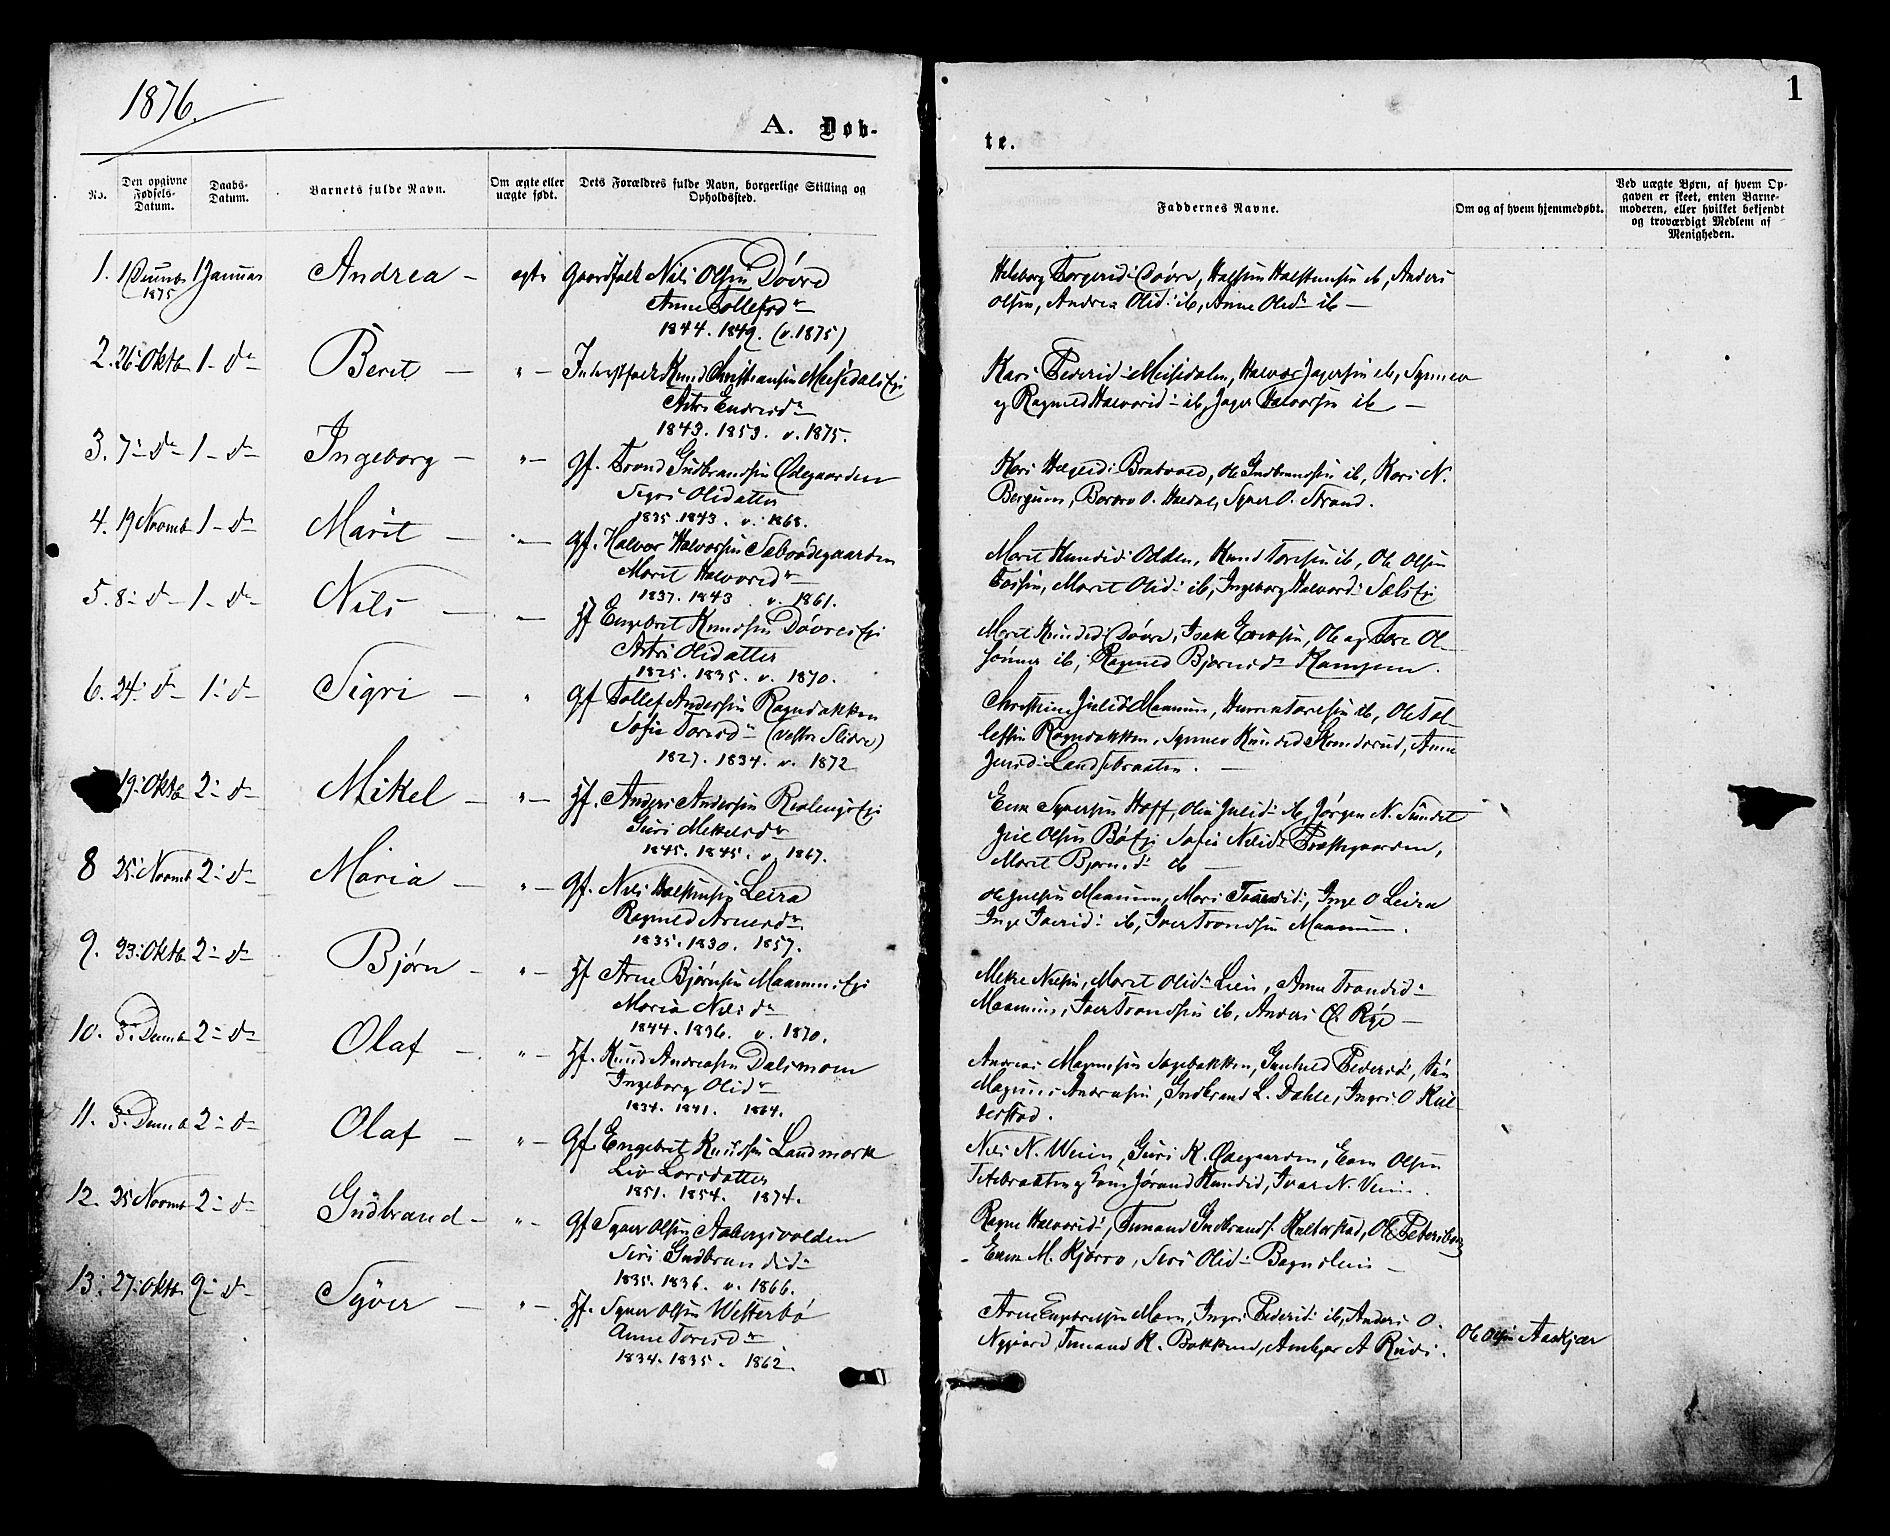 SAH, Nord-Aurdal prestekontor, Ministerialbok nr. 9, 1876-1882, s. 1